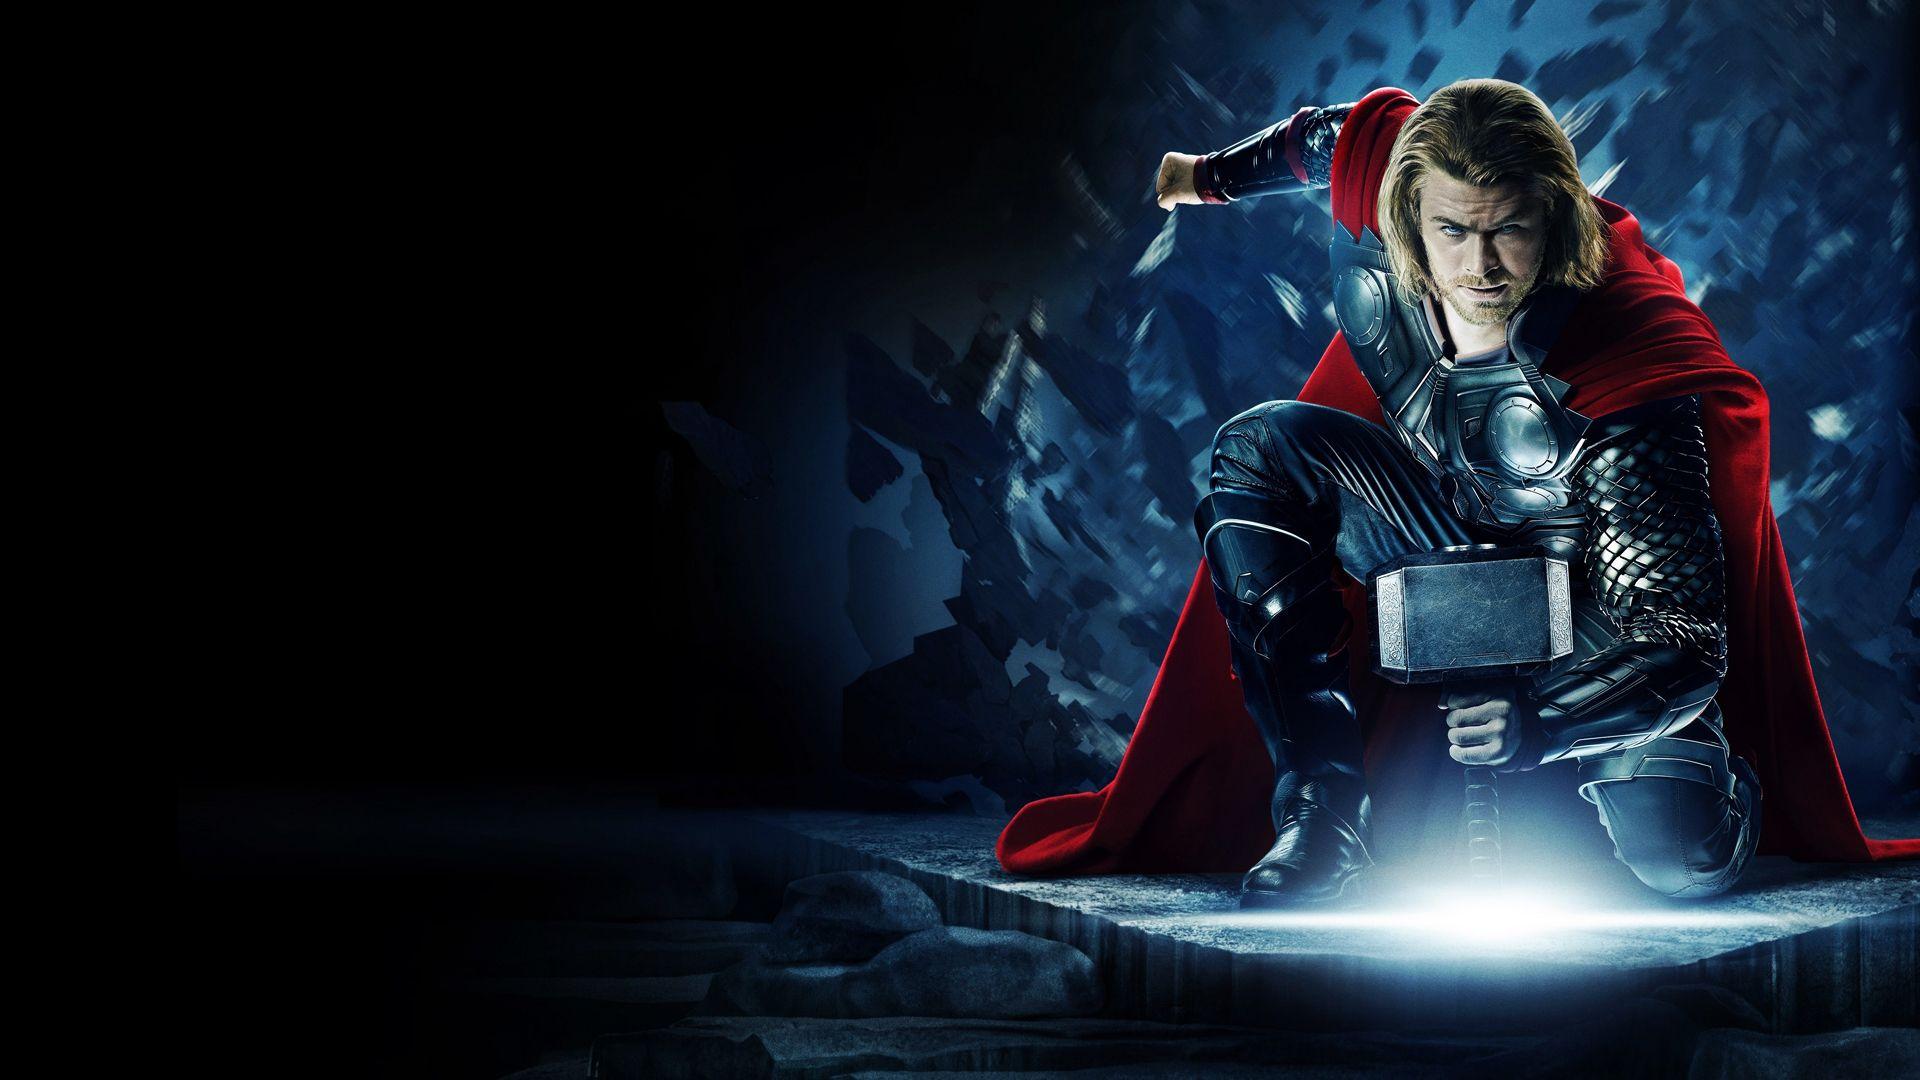 Best Superheroes hd Wallpapers images 1920x1080